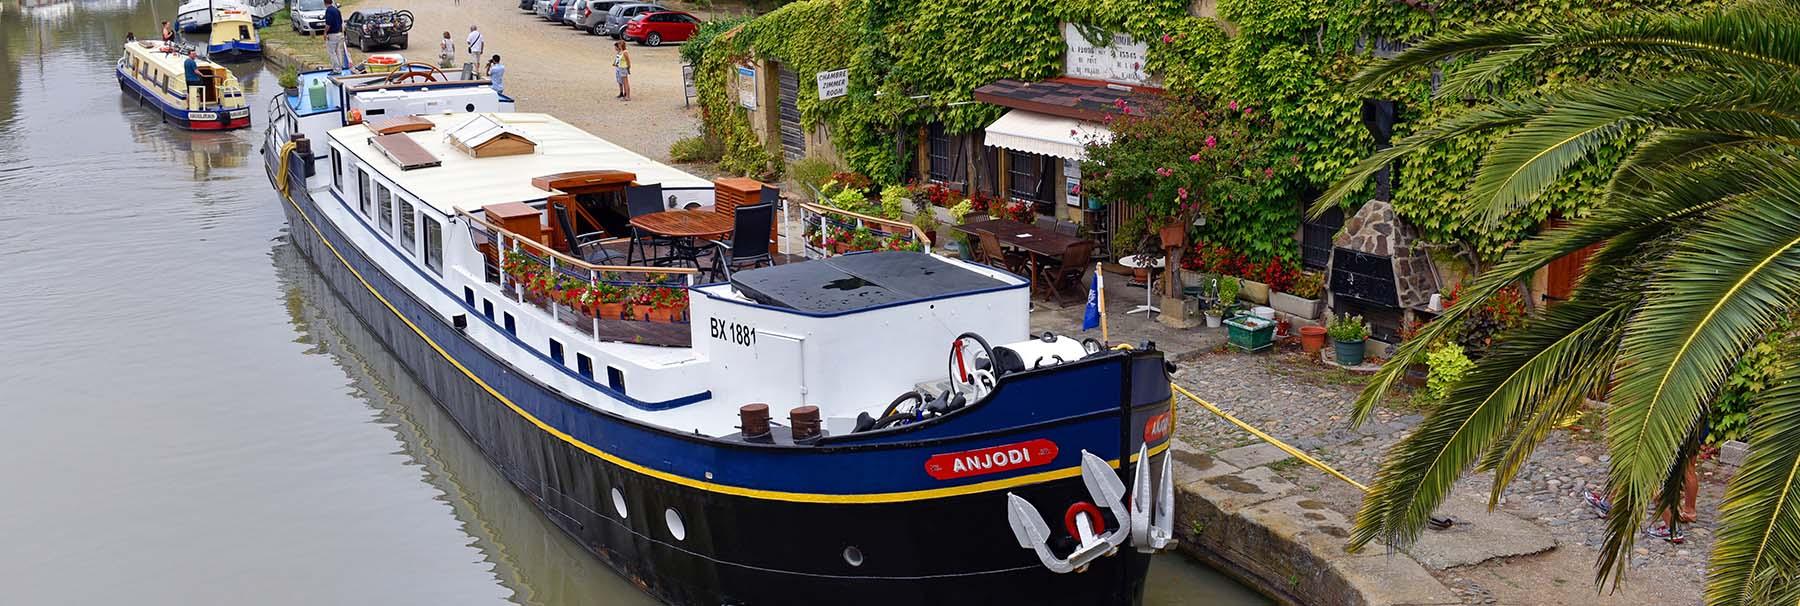 Canal du Midi Cruise on Abercrombie & Kent Anjodi